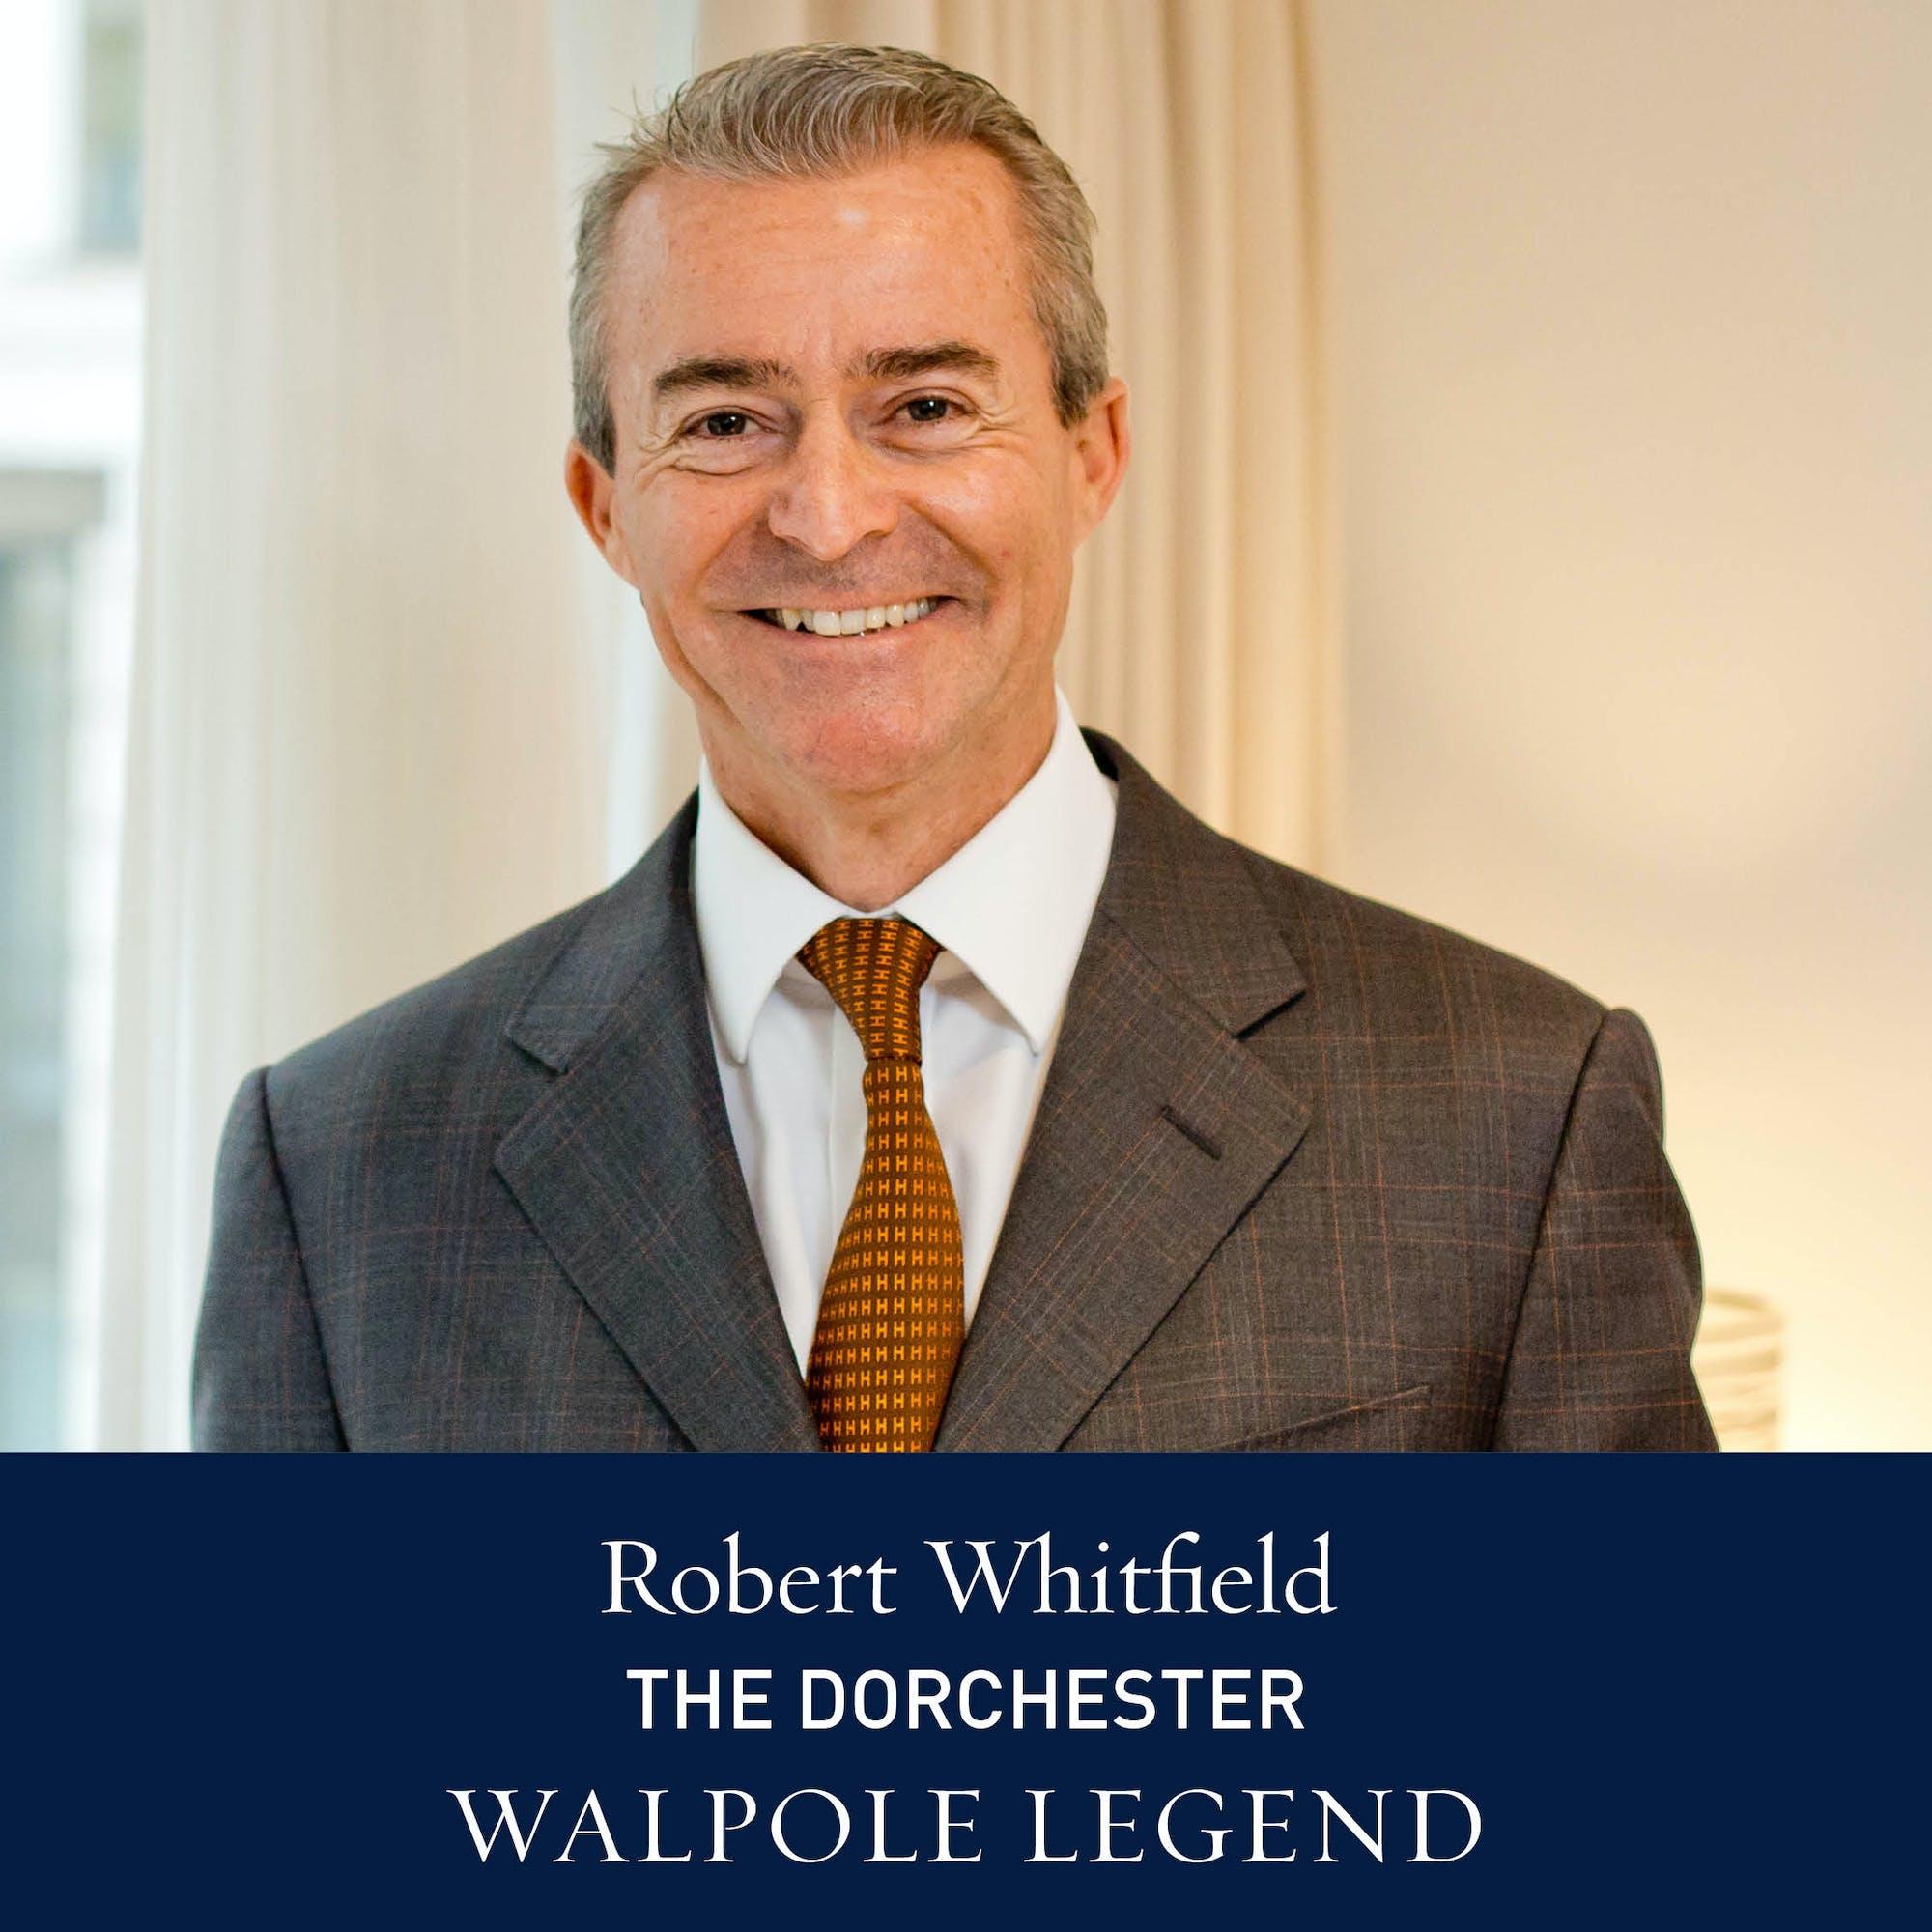 The Walpole Power List 2020  The Legends: Robert Whitfield, Regional Director, UK & General Manager, The Dorchester